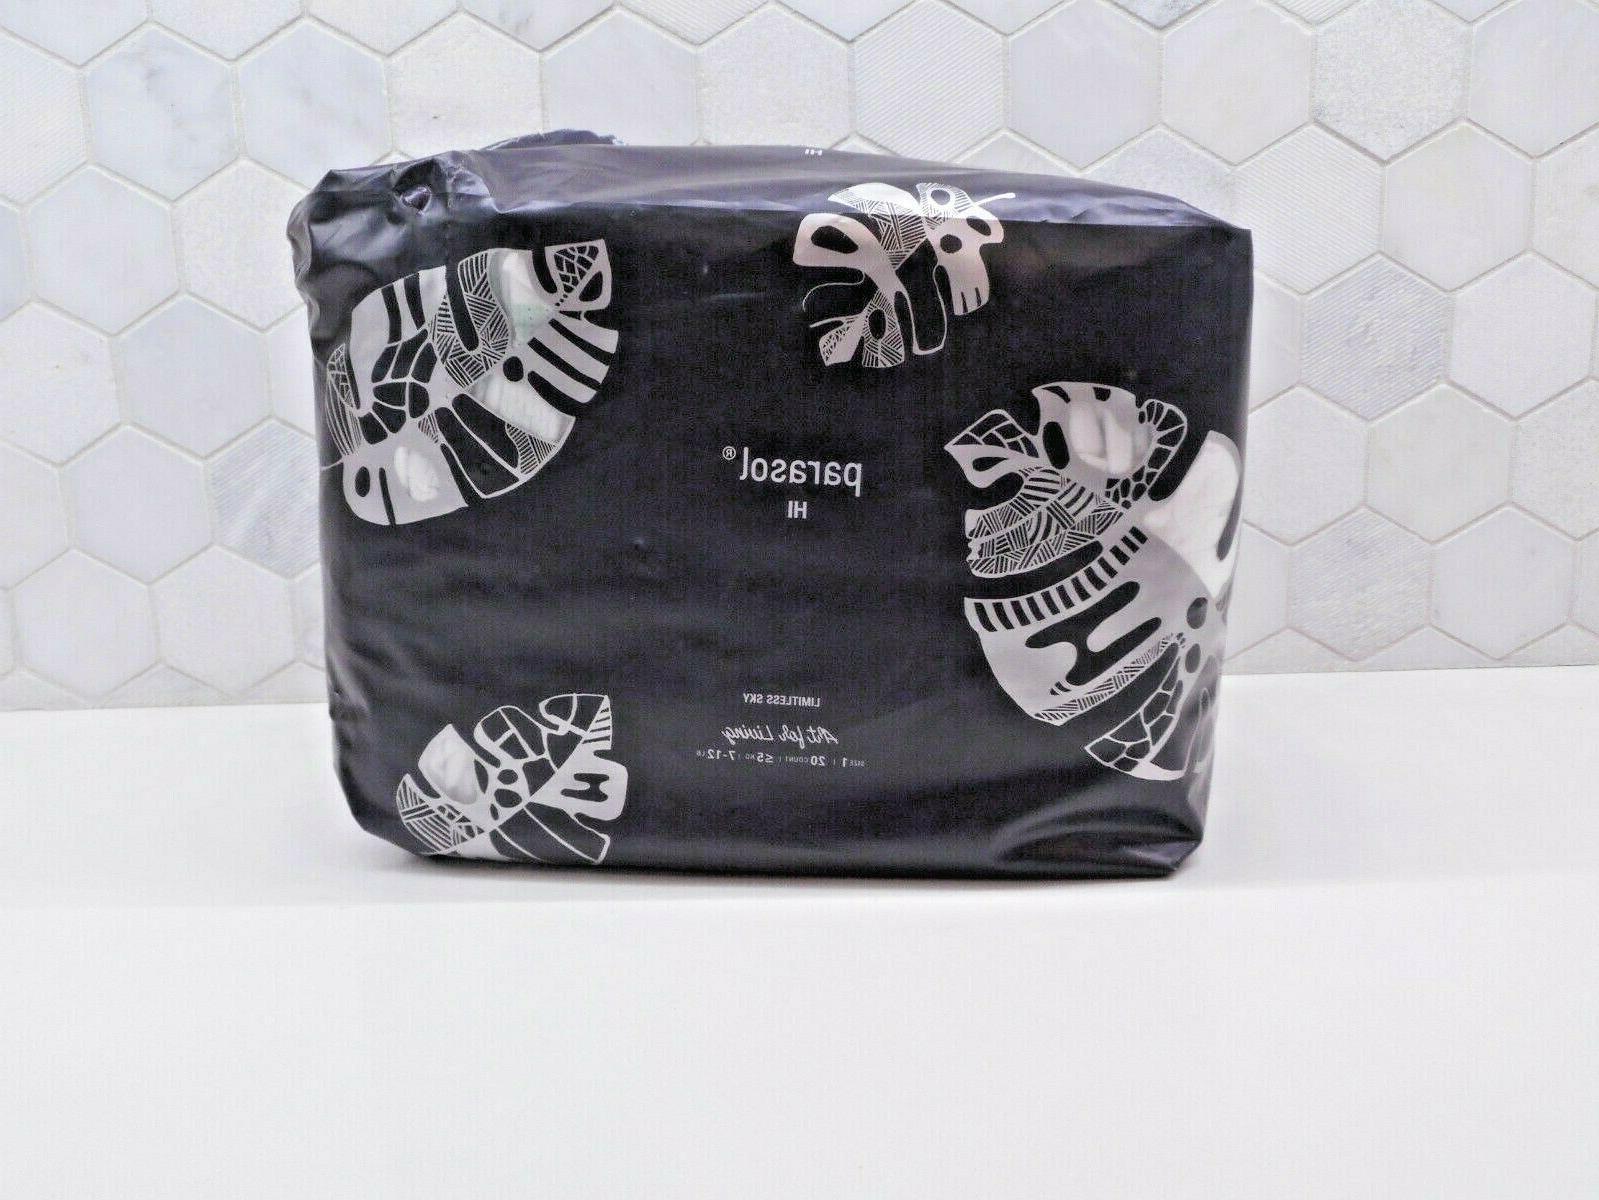 parasol baby diapers hypoallergenic chlorine free sensitive